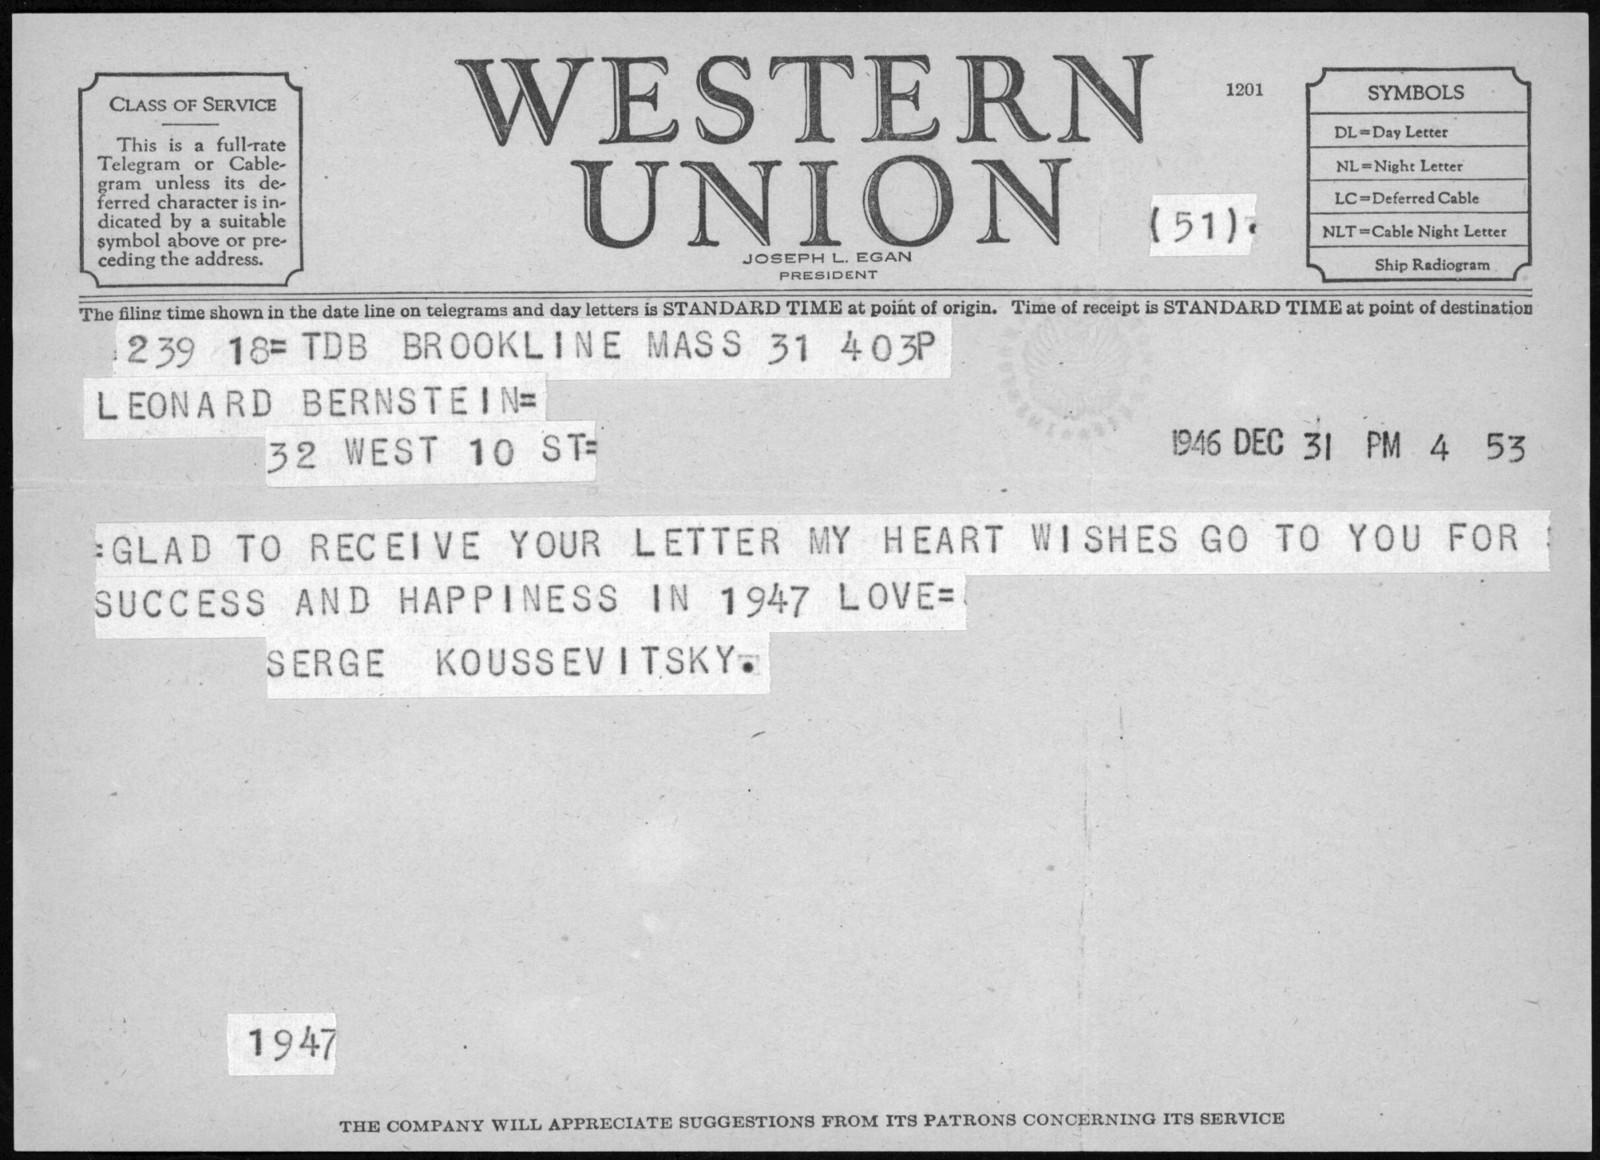 Letter from Serge Koussevitzky to Leonard Bernstein, December 31, 1946